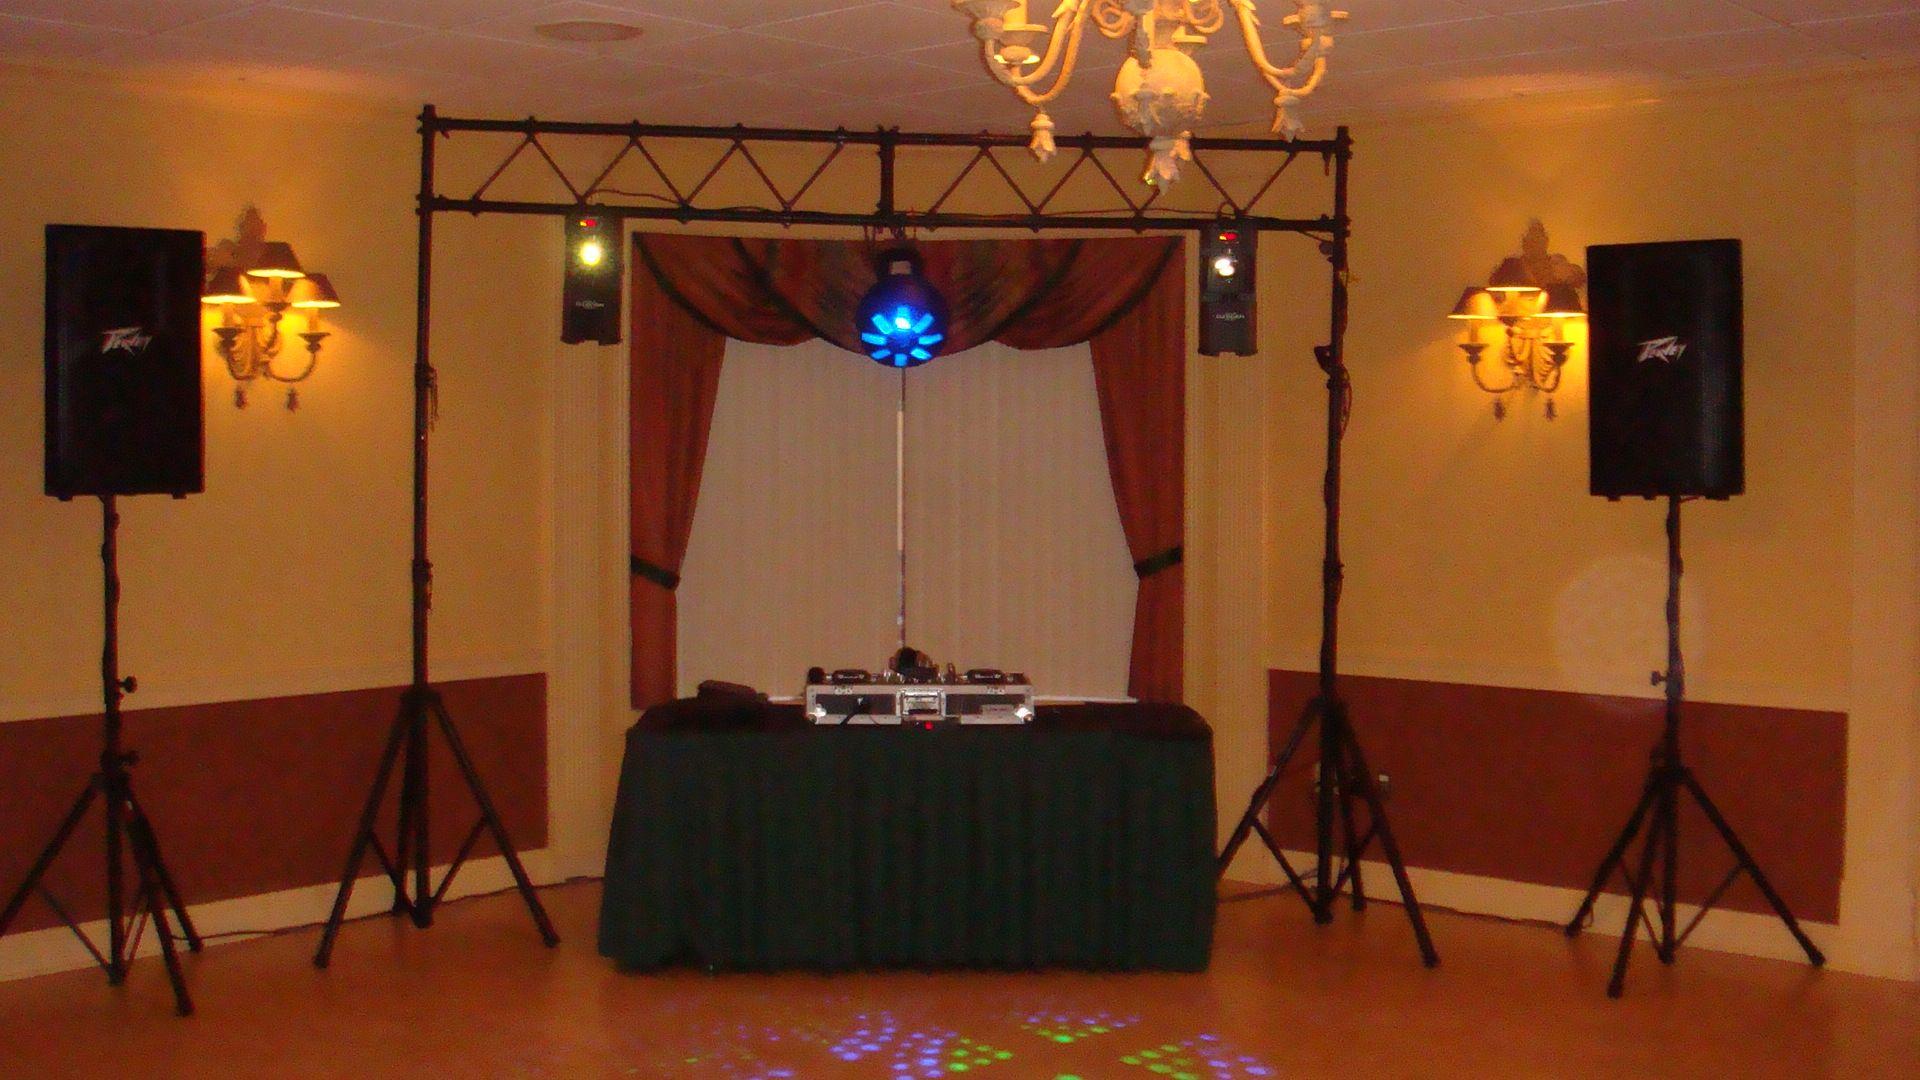 Dj Booth For Sale >> Pin by Probiotic Soundsystem on Cool DJ Booths | Dj setup ...